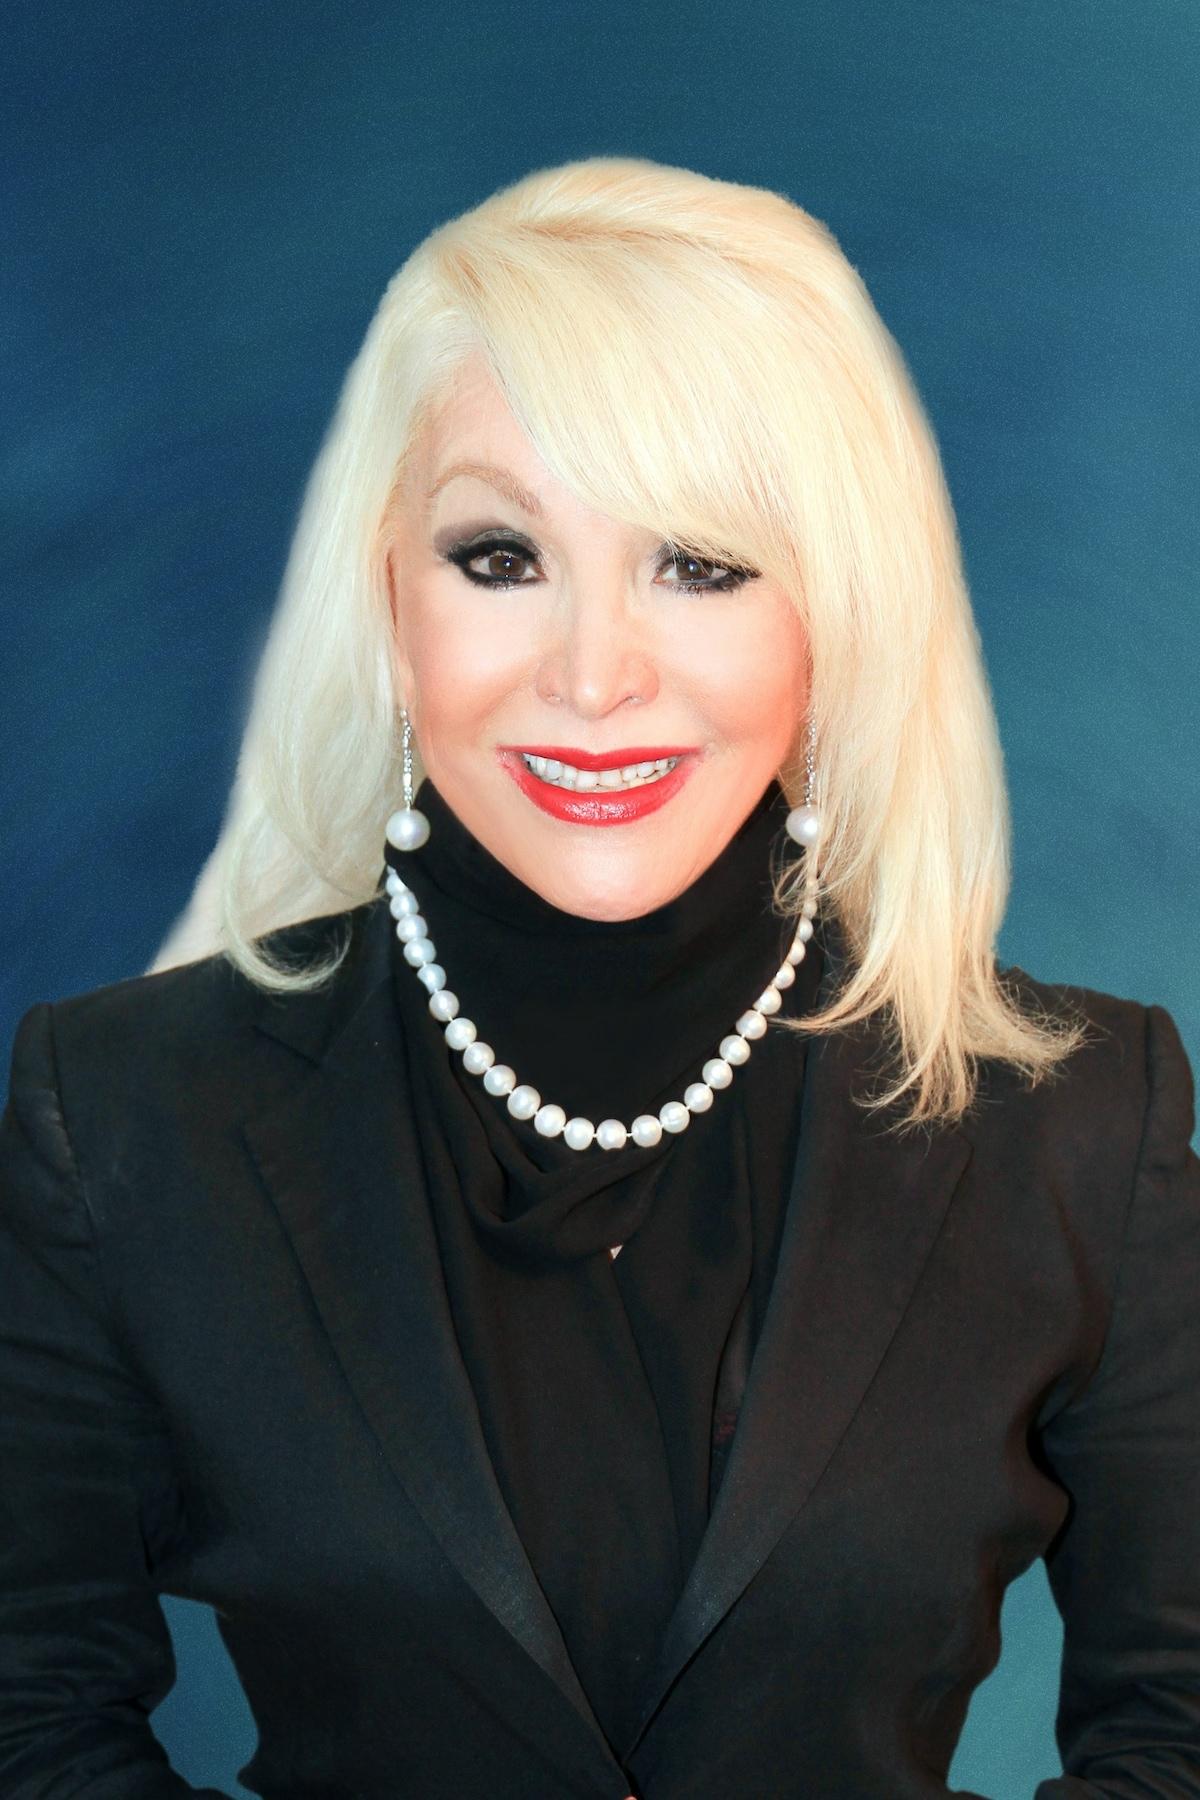 Shelley from Santa Monica